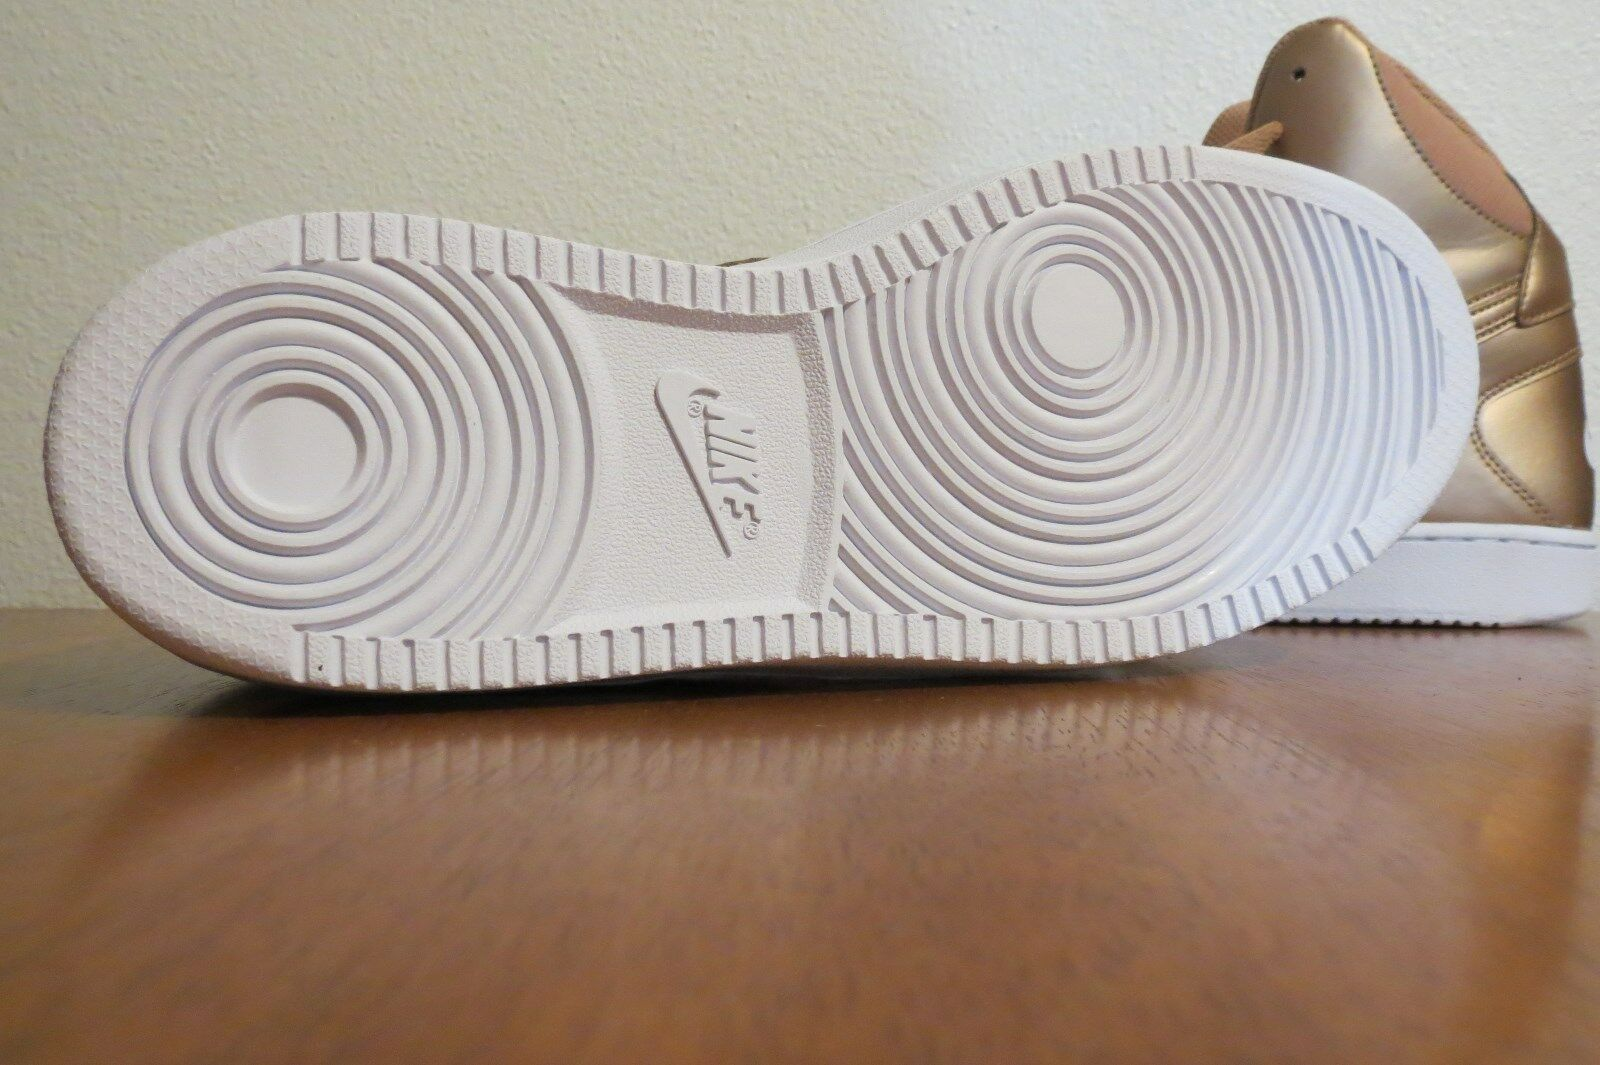 NIKE Son of Force METALLIC Mid High Top Sneaker Sneaker Sneaker shoes  womens 10.5  NEW 687f71